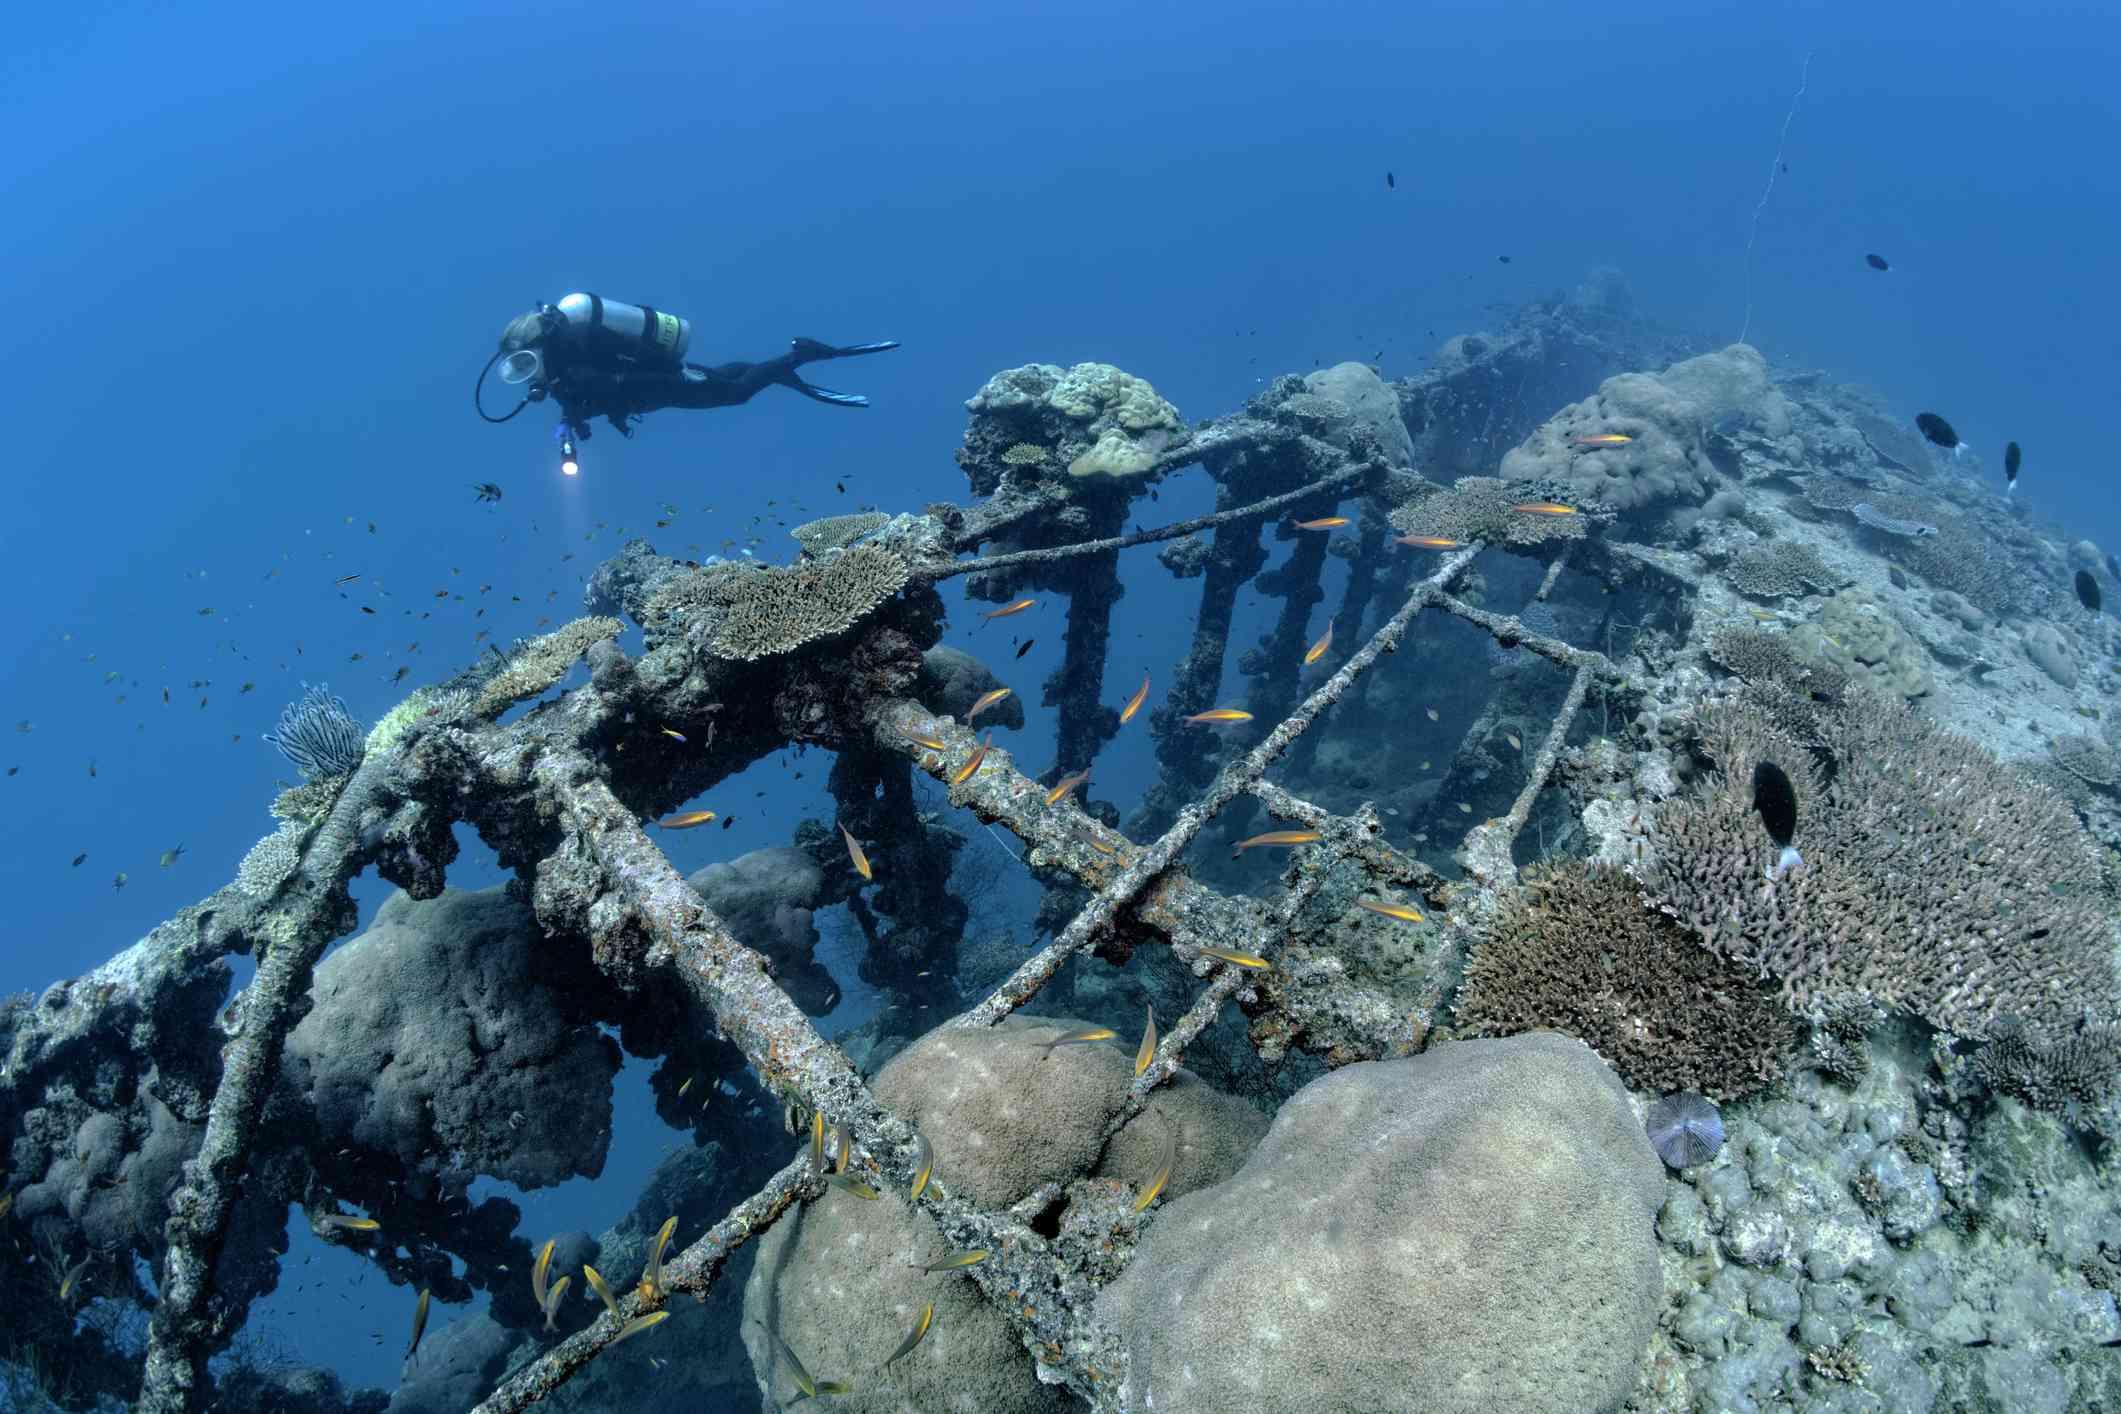 Diver near British Loyalty shipwreck